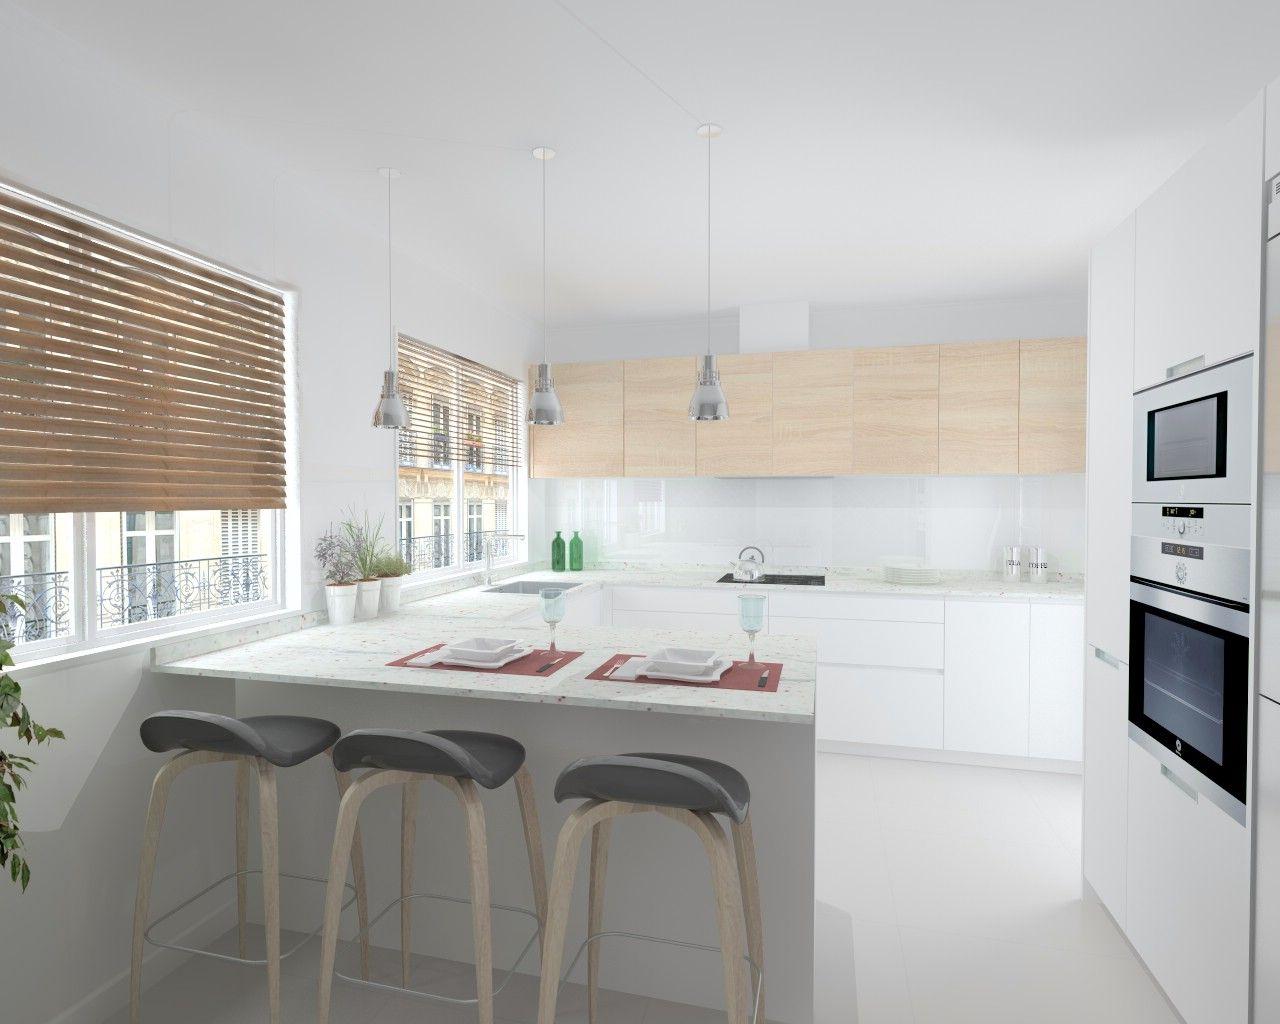 Cocinas blancas con granito fabulous de cocinas modernas - Encimeras cocinas blancas ...